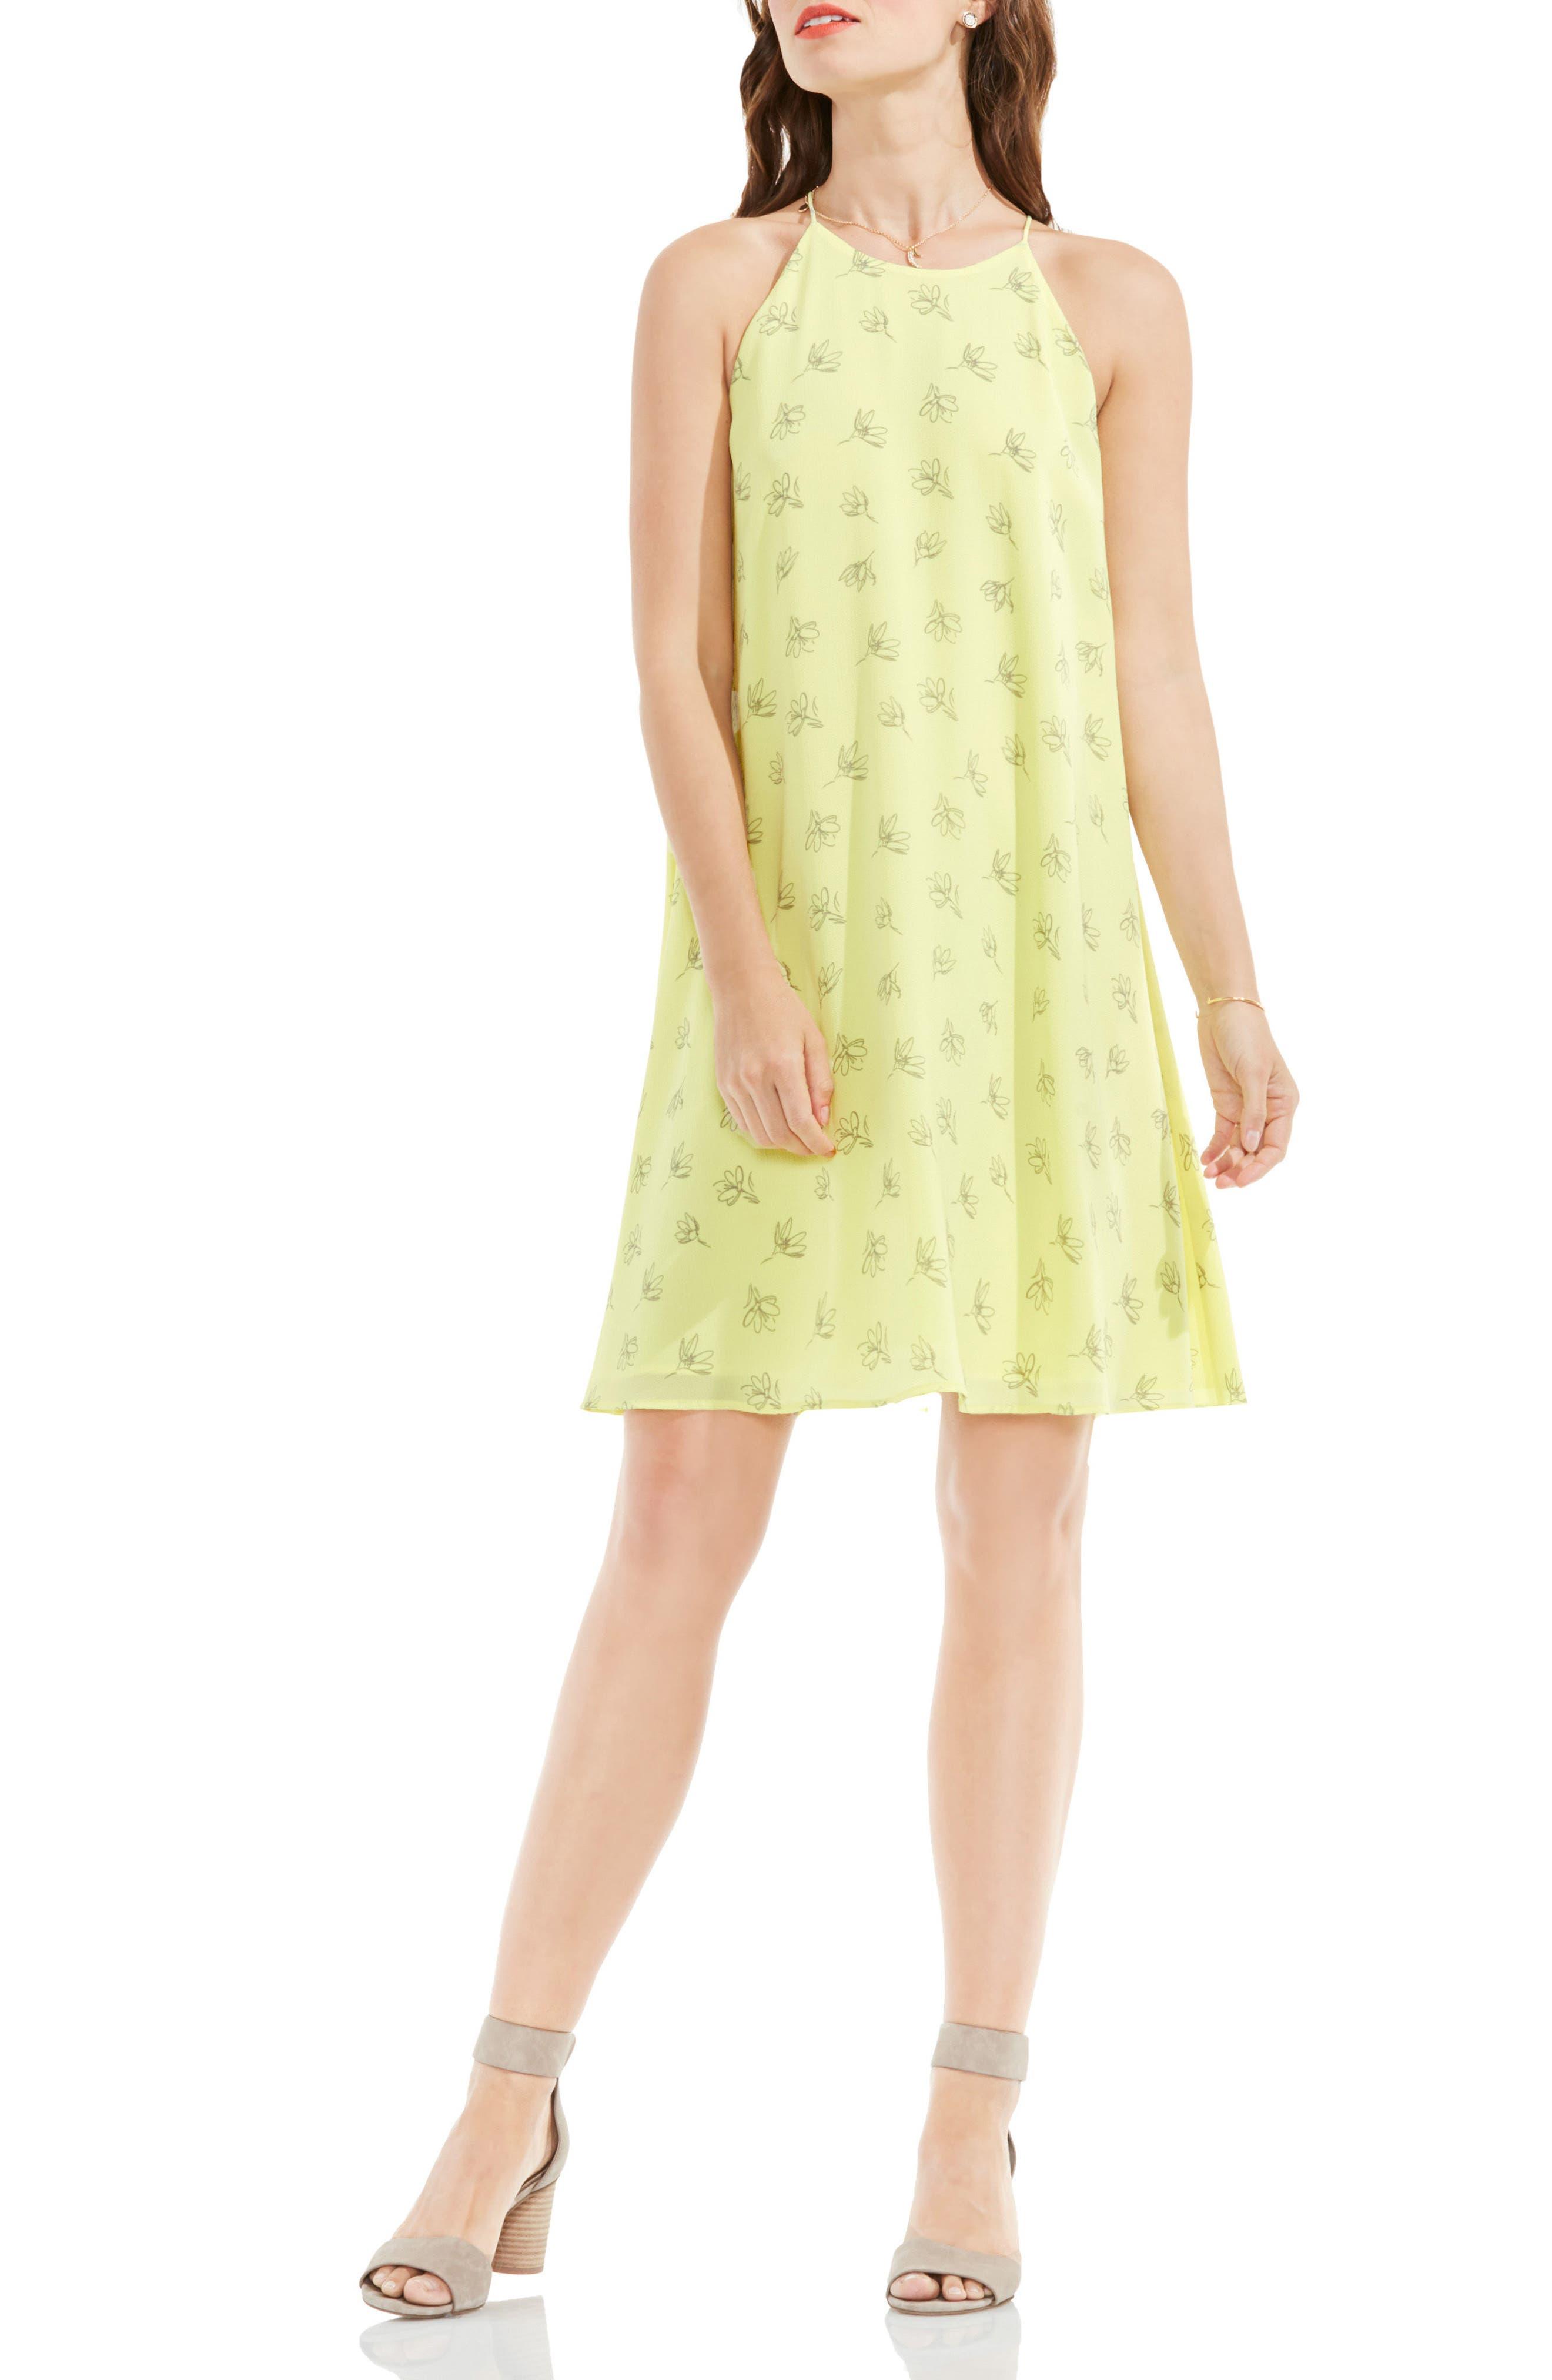 Alternate Image 1 Selected - Vince Camuto Fluent Flowers Print Sleeveless A-Line Dress